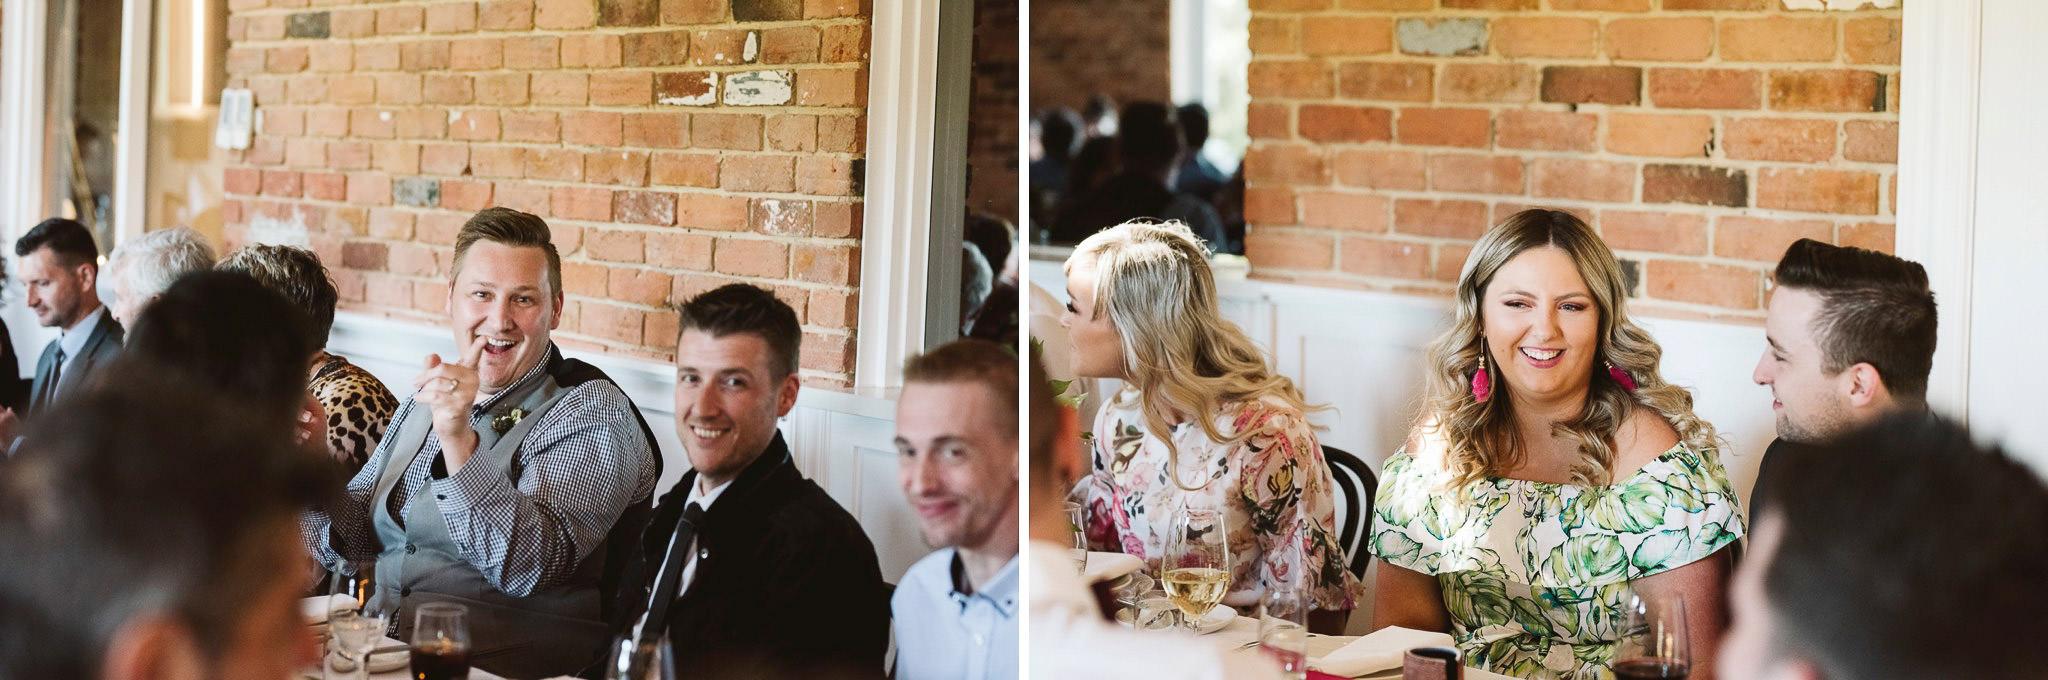 The Farm Yarra Valley Wedding Photography Ashleigh Haase-72.jpg